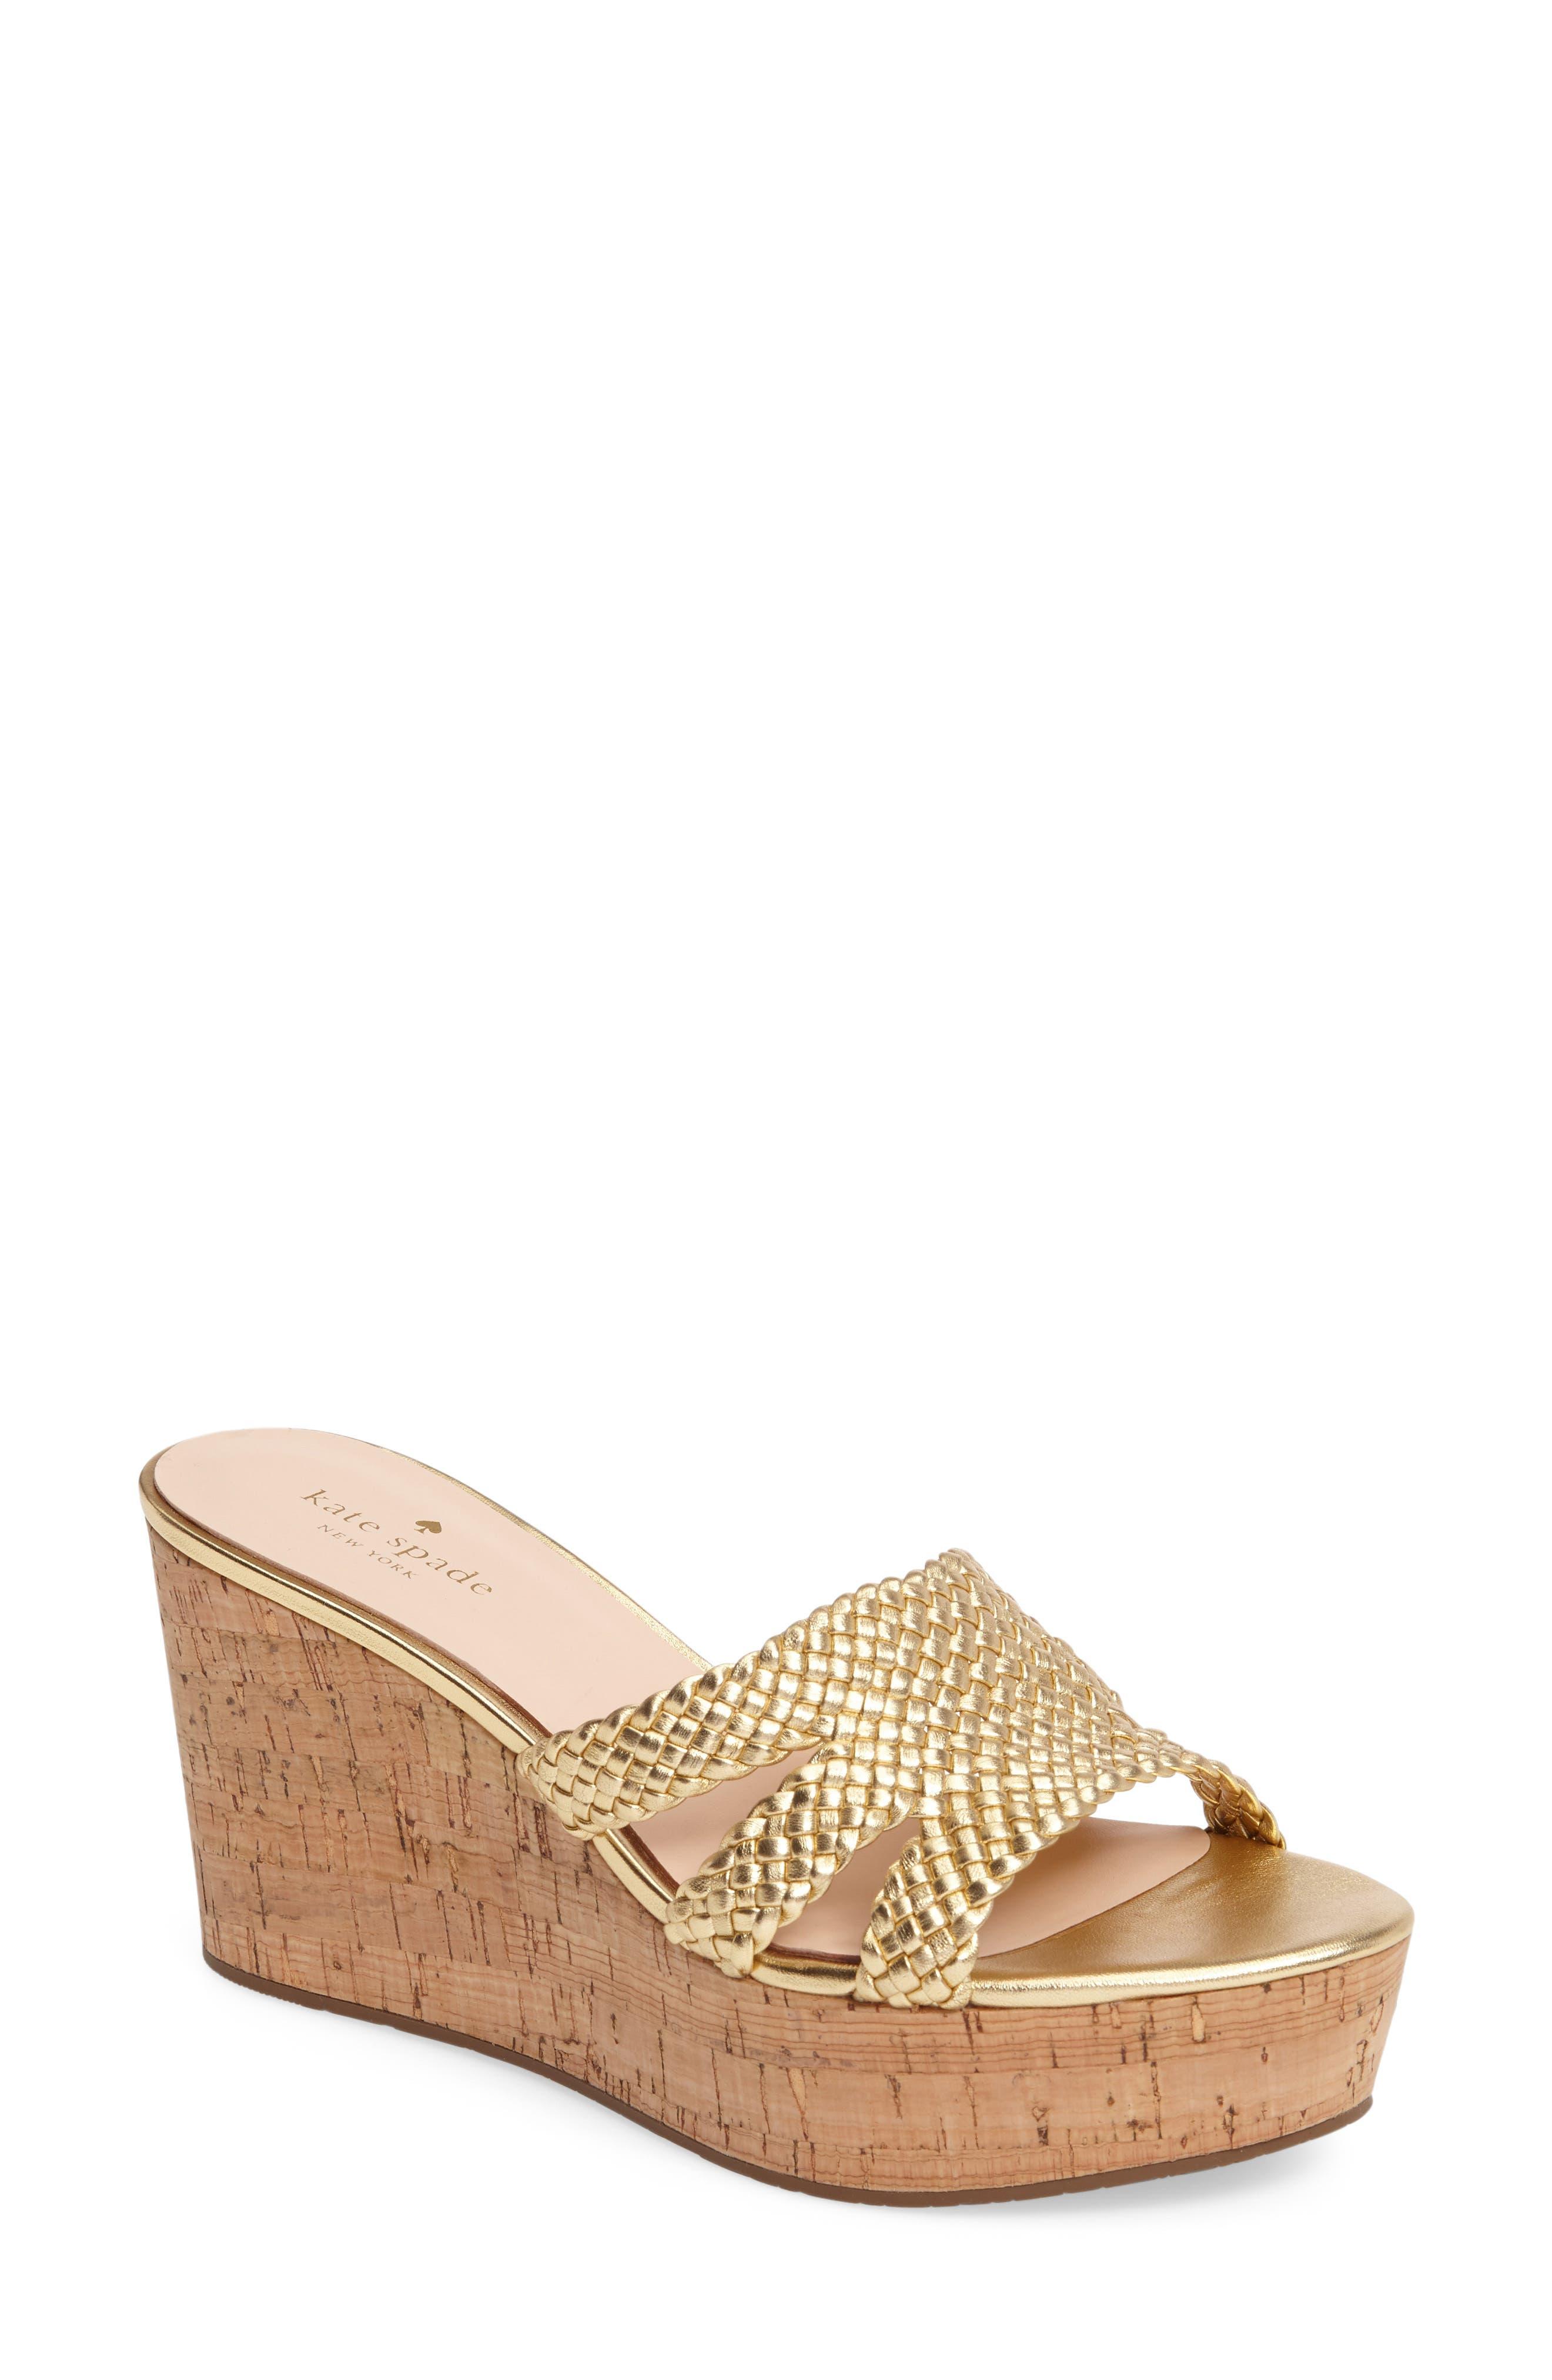 tarvela wedge sandal,                             Main thumbnail 1, color,                             Old Gold Woven Metallic Nappa